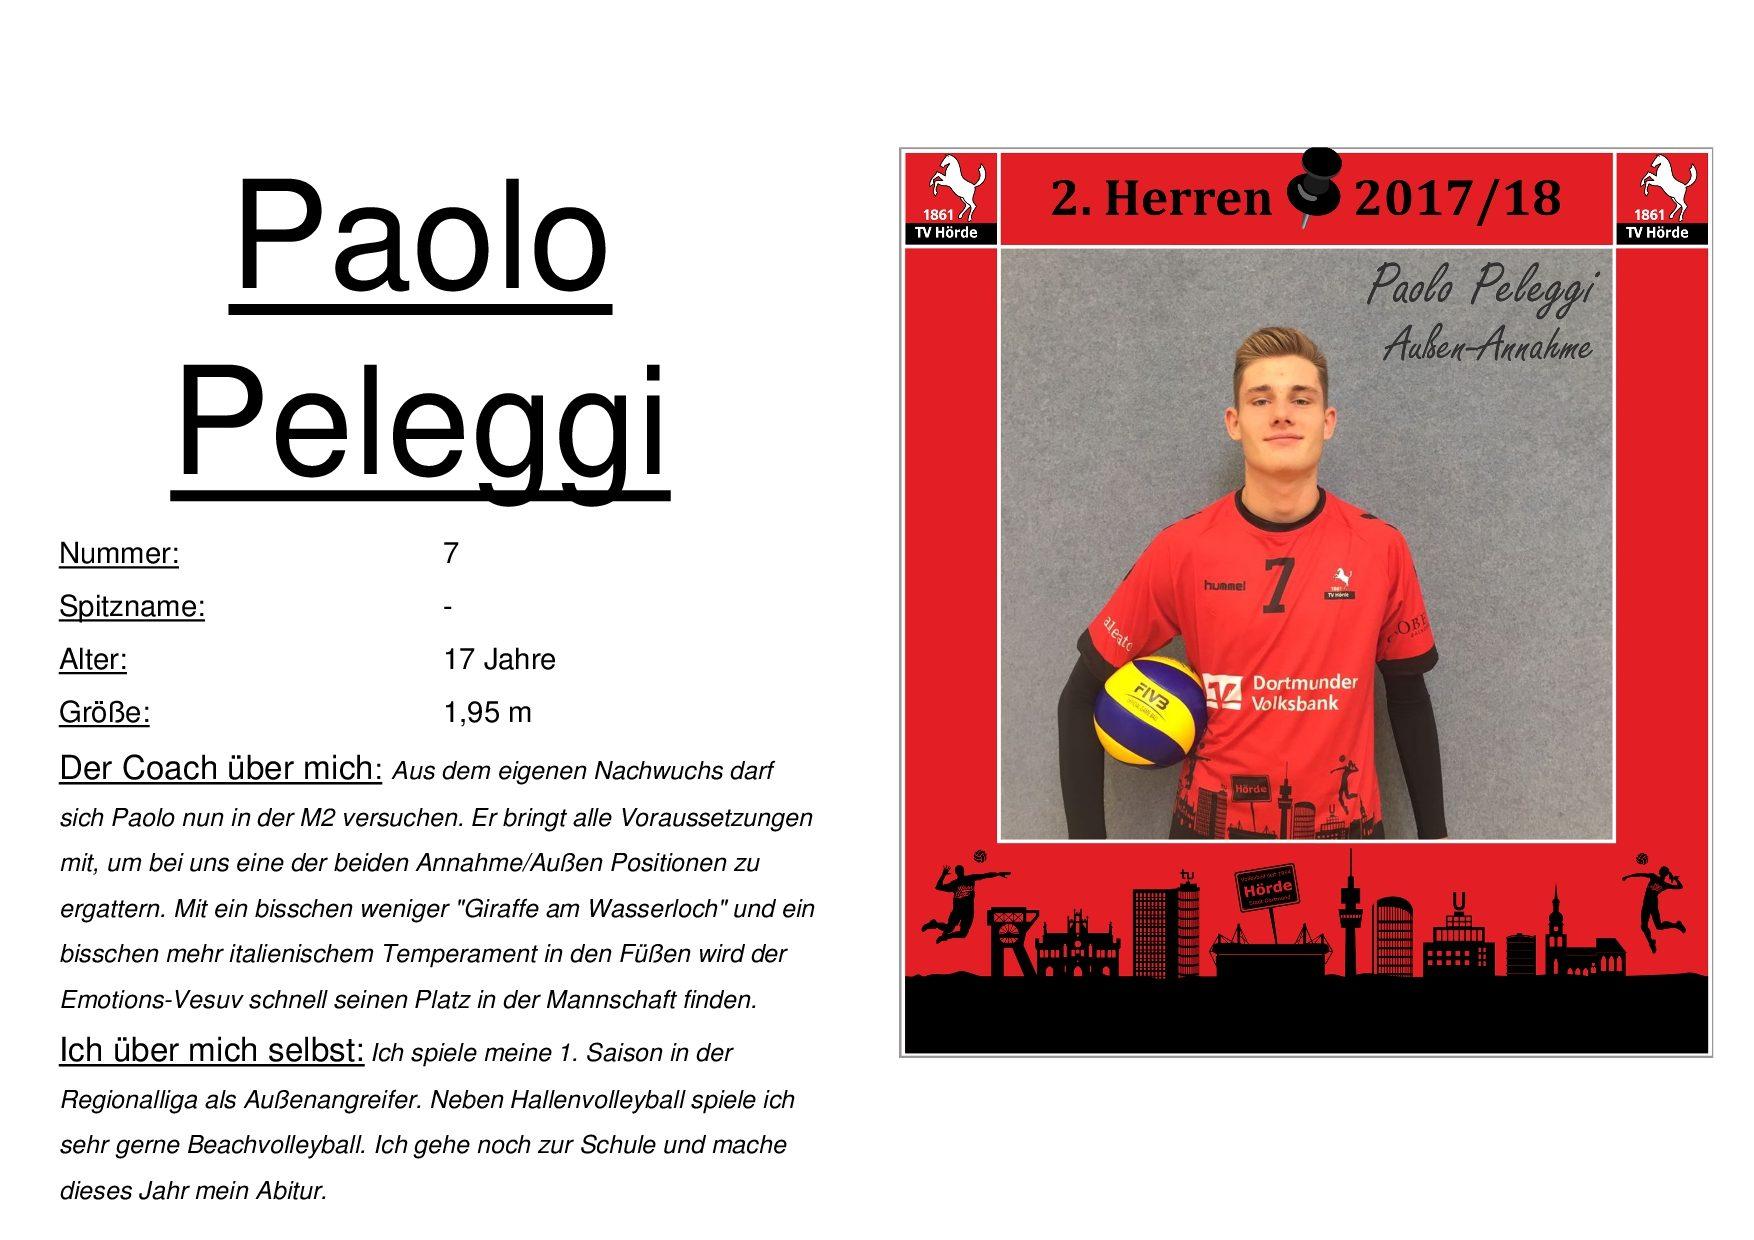 Paolo Peleggi